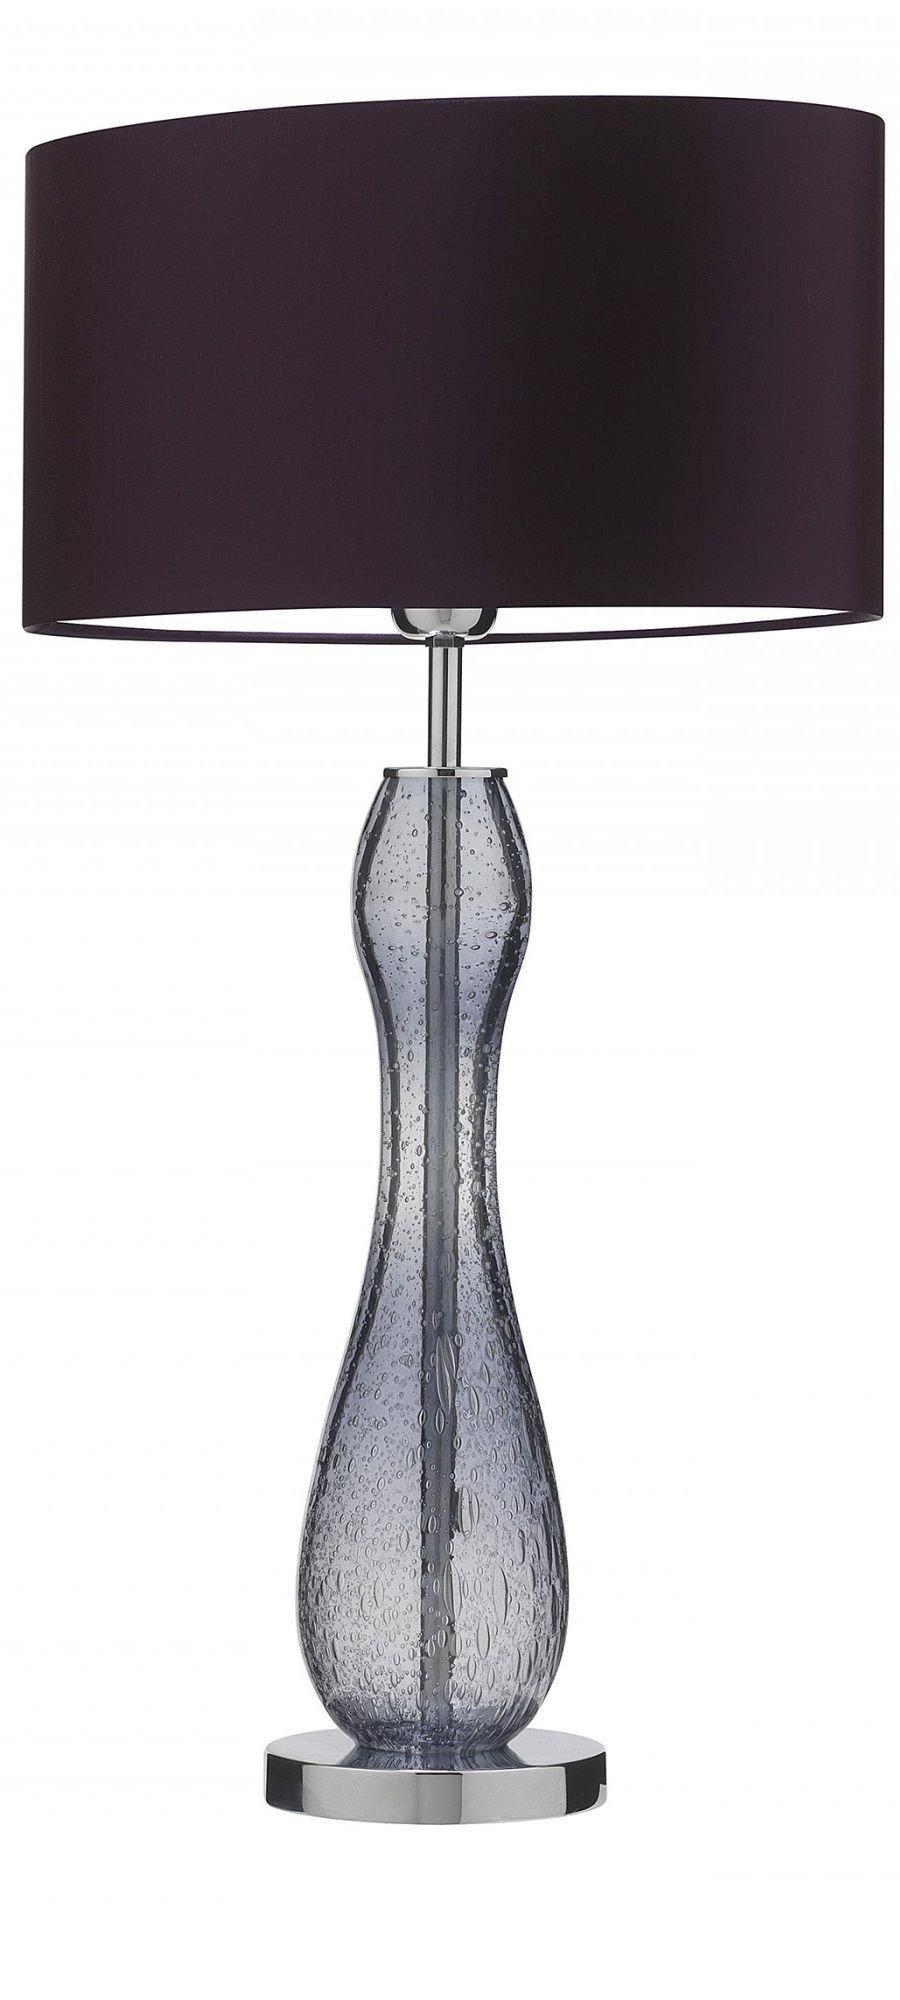 "Modern Table Lamp for Bedroom Luxury Purple"" Purple Table Lamp Table Lamps Modern Table Lamps"